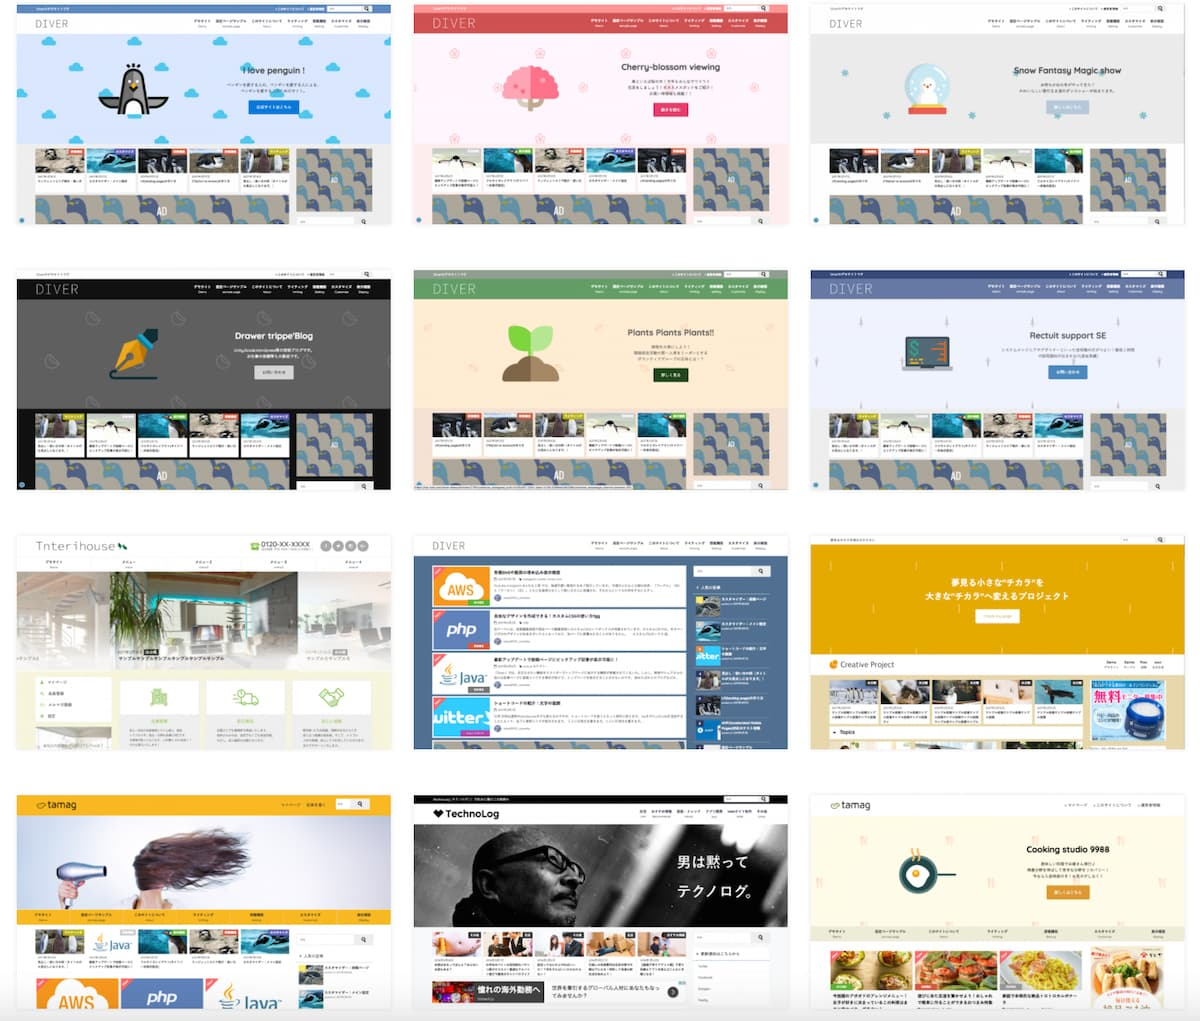 Diverのデザインは個人ブログや企業サイトでも使える点が魅力